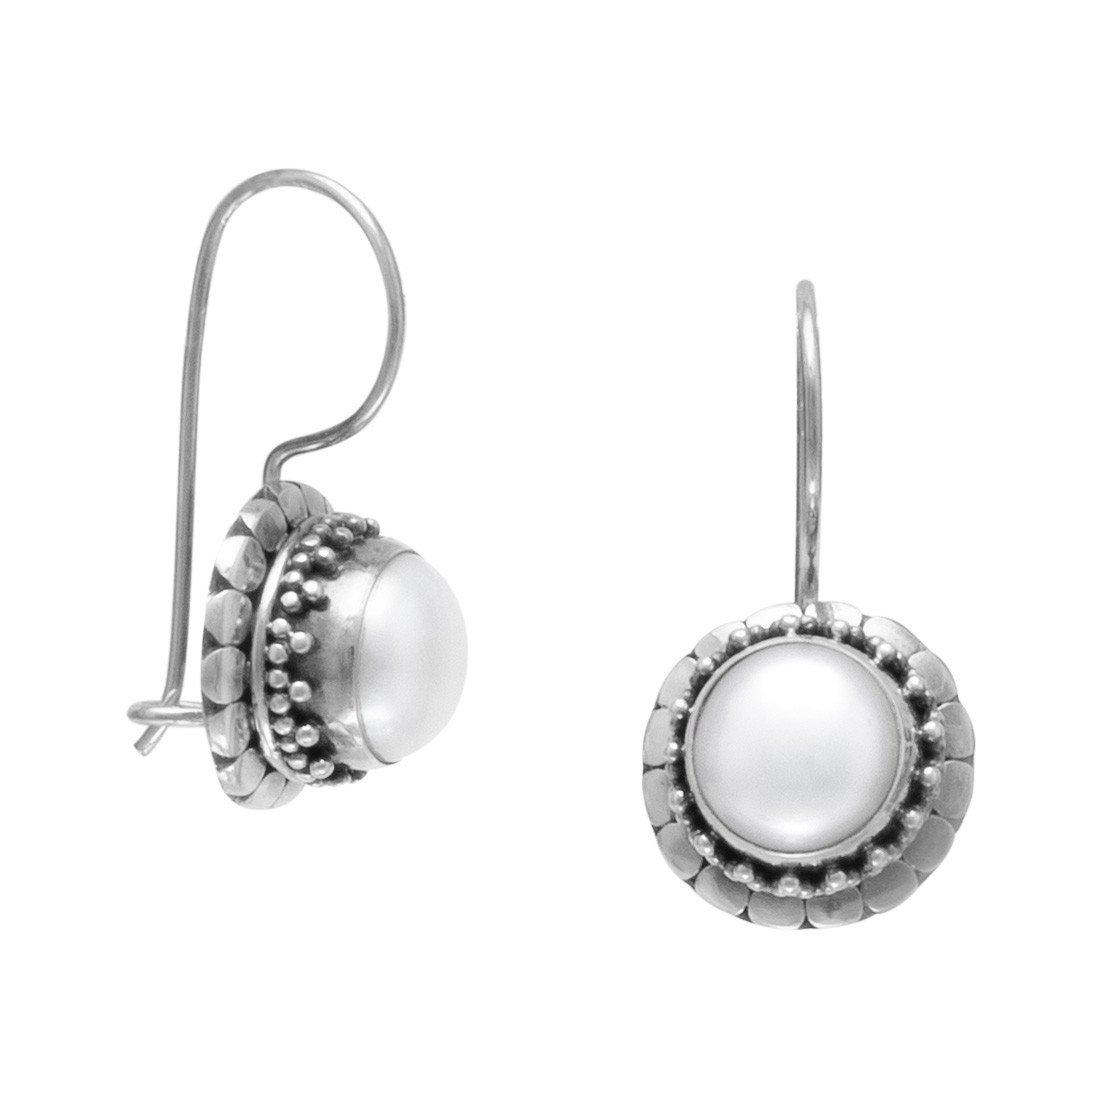 Handmade Oxidized Cultured Freshwater Pearl Earrings with Dot Edge